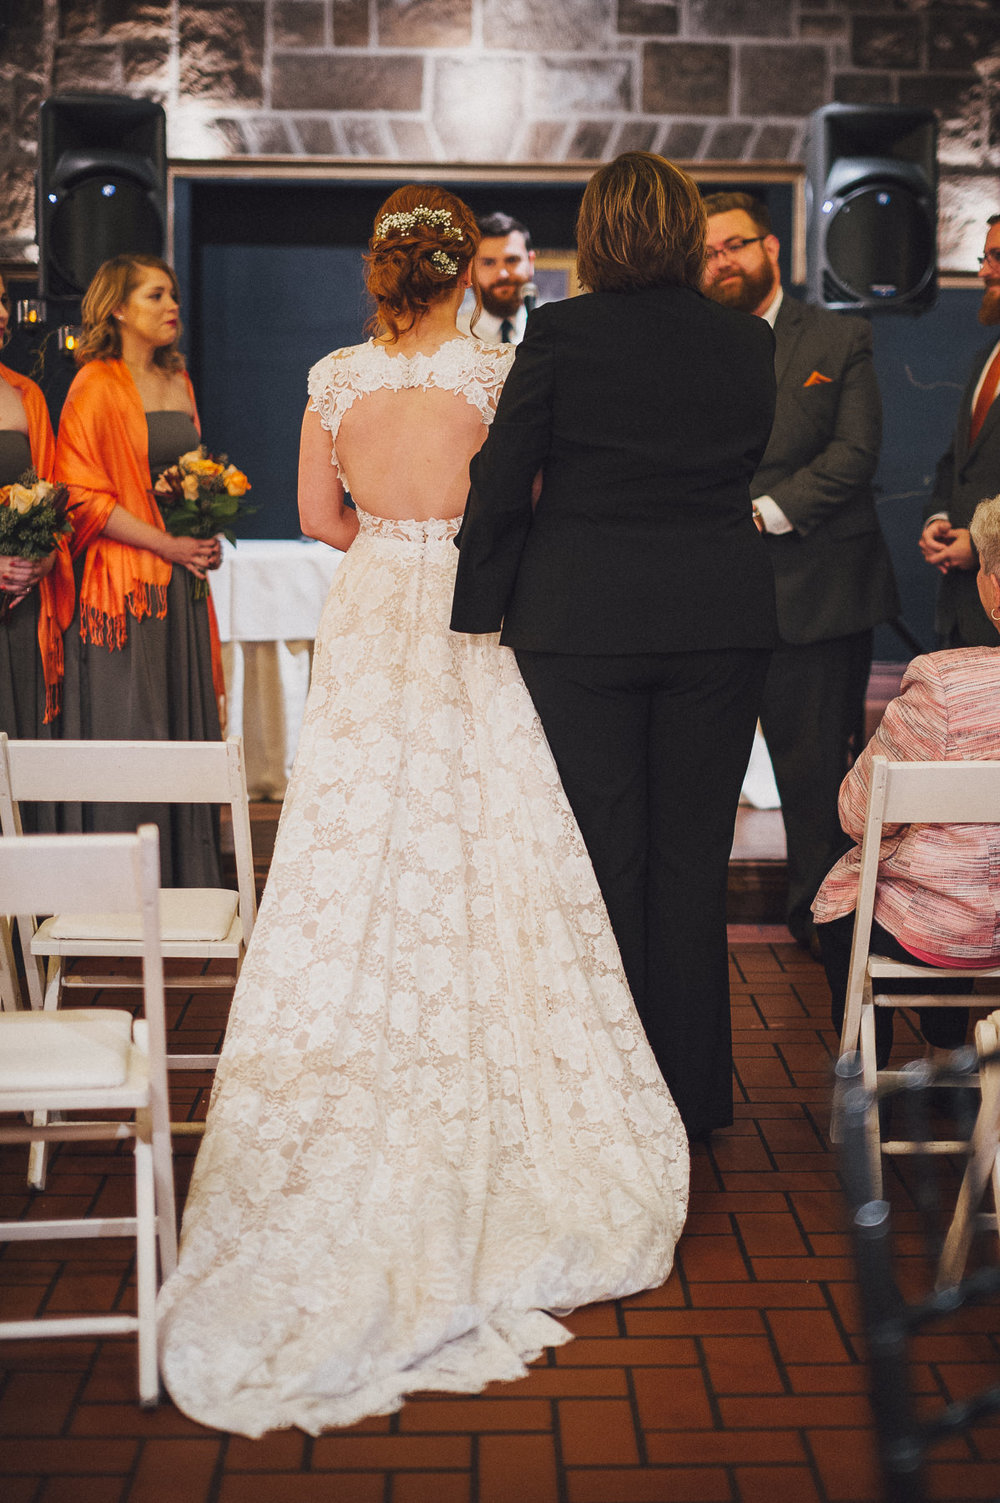 breighton-and-basette-photography-copyrighted-image-blog-amanda-and-eric-wedding-077.jpg